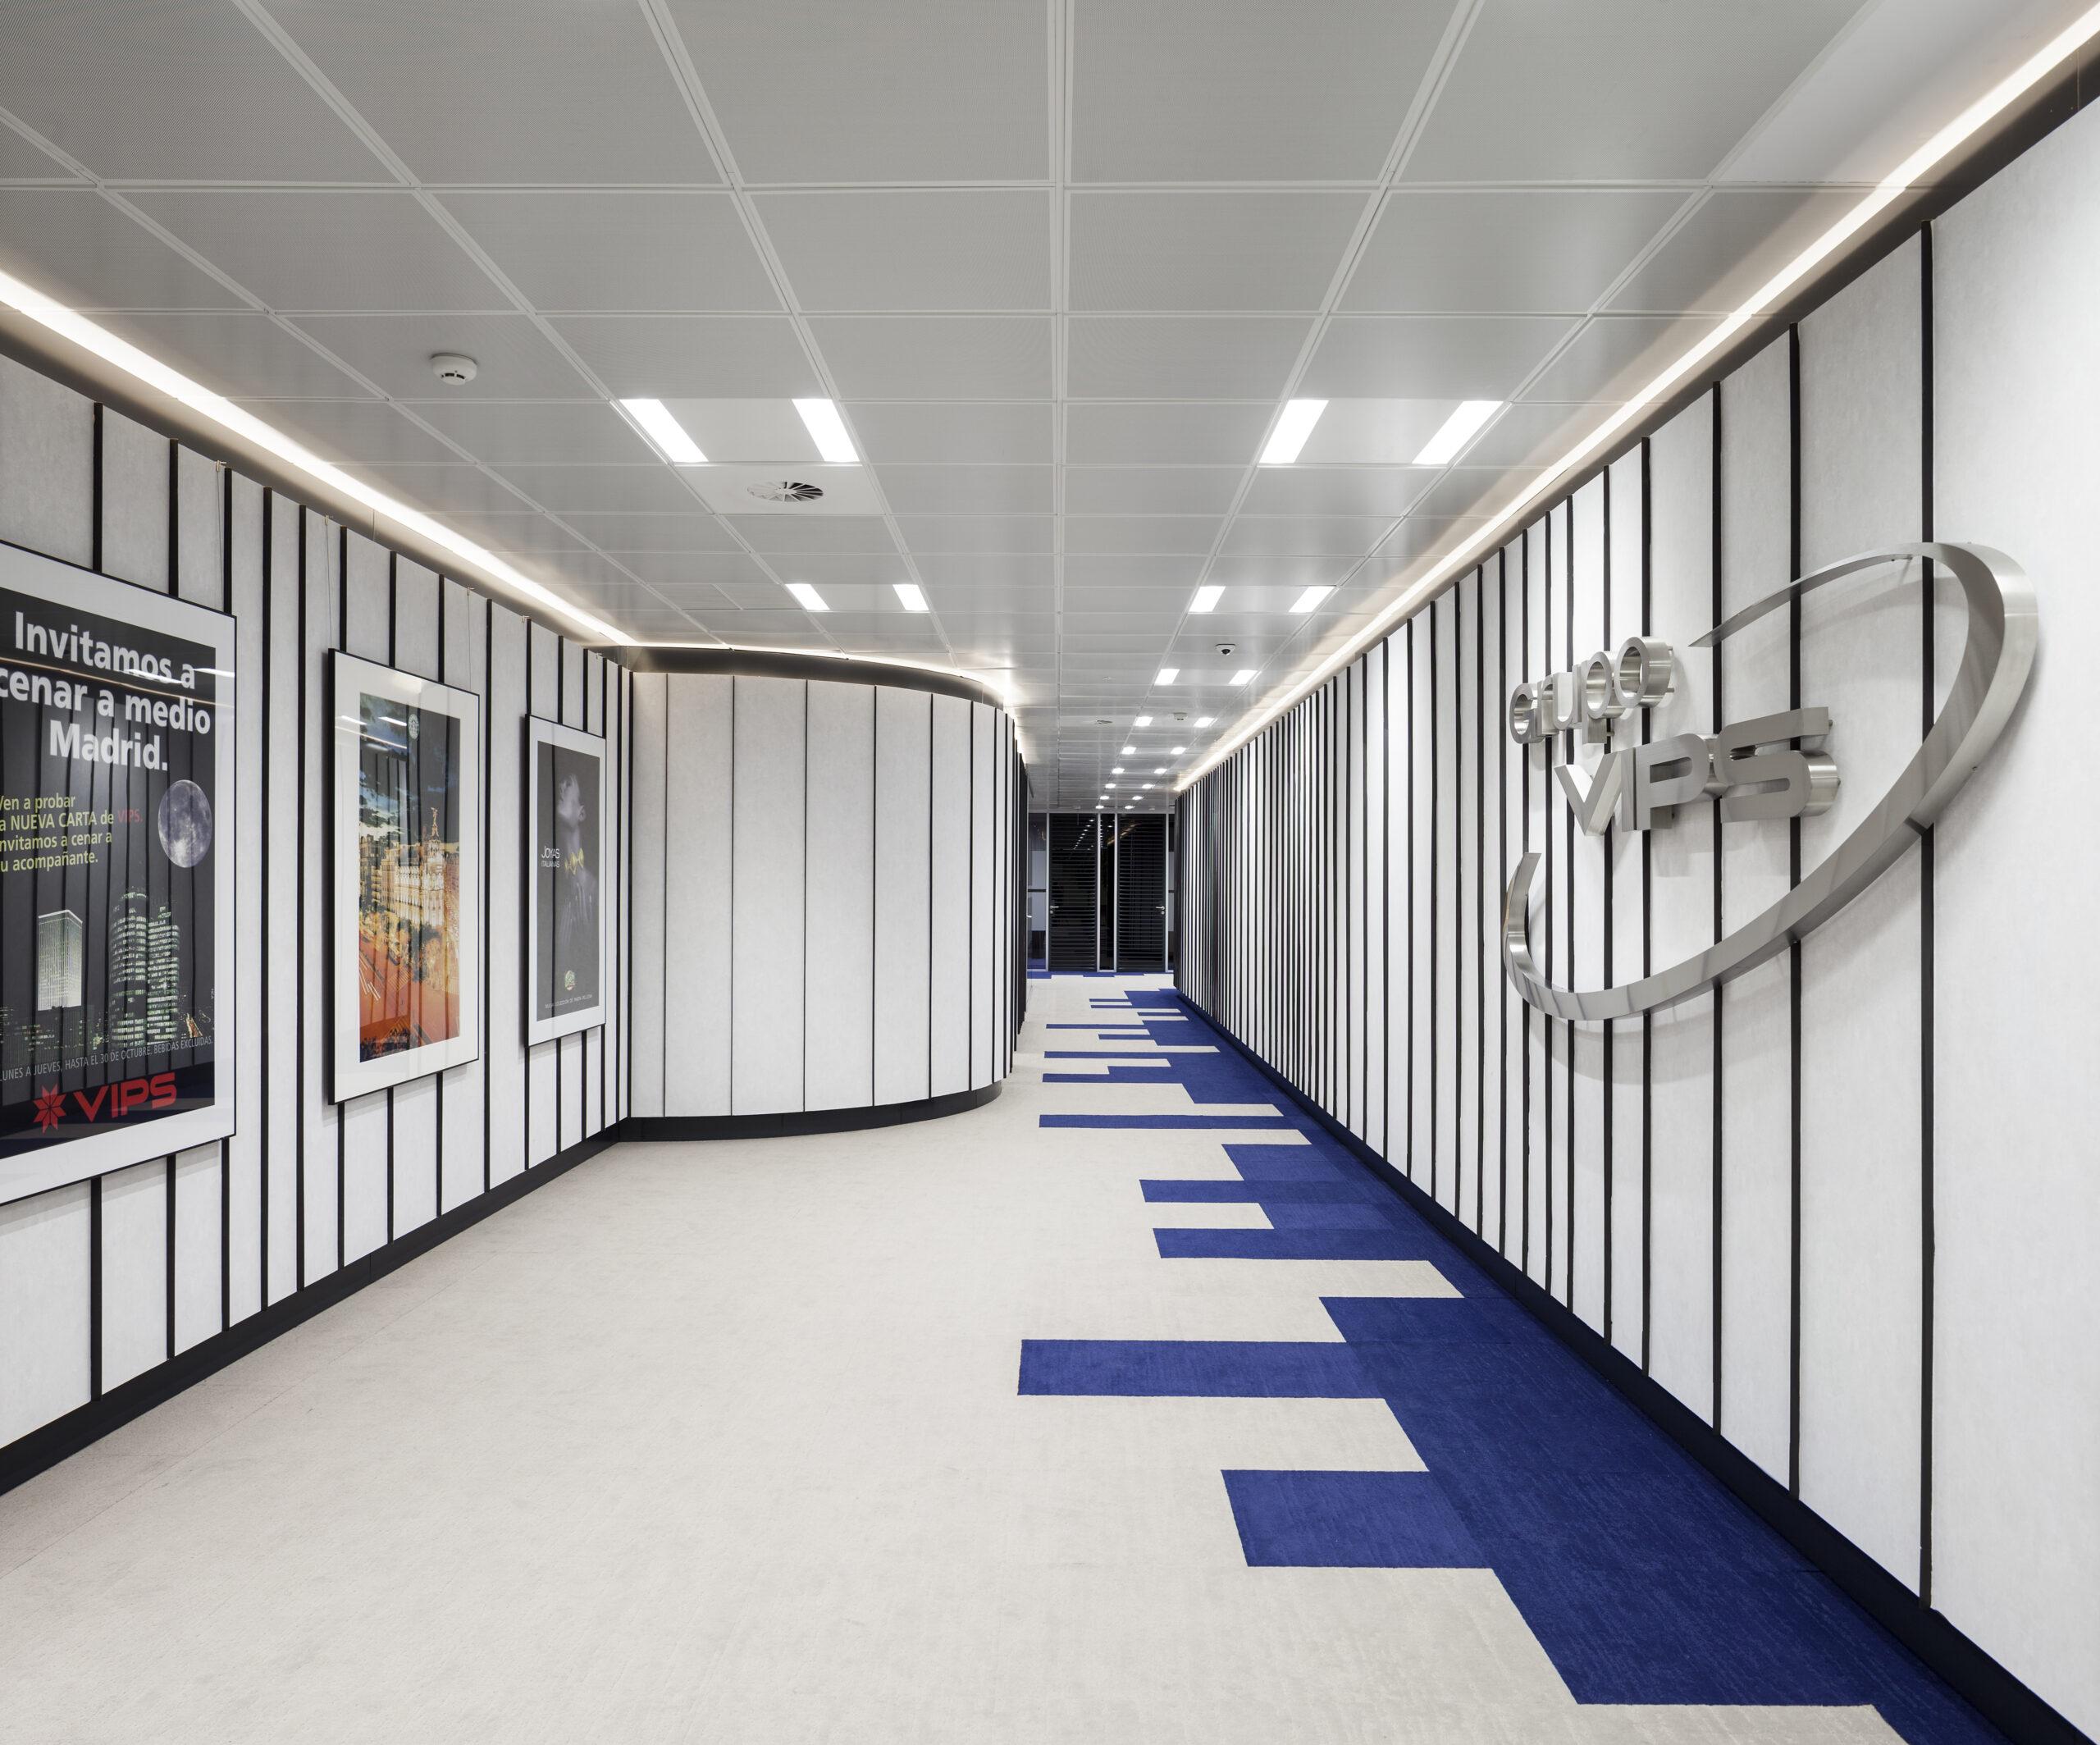 Oficinas Grupo Vips, Madrid (2)